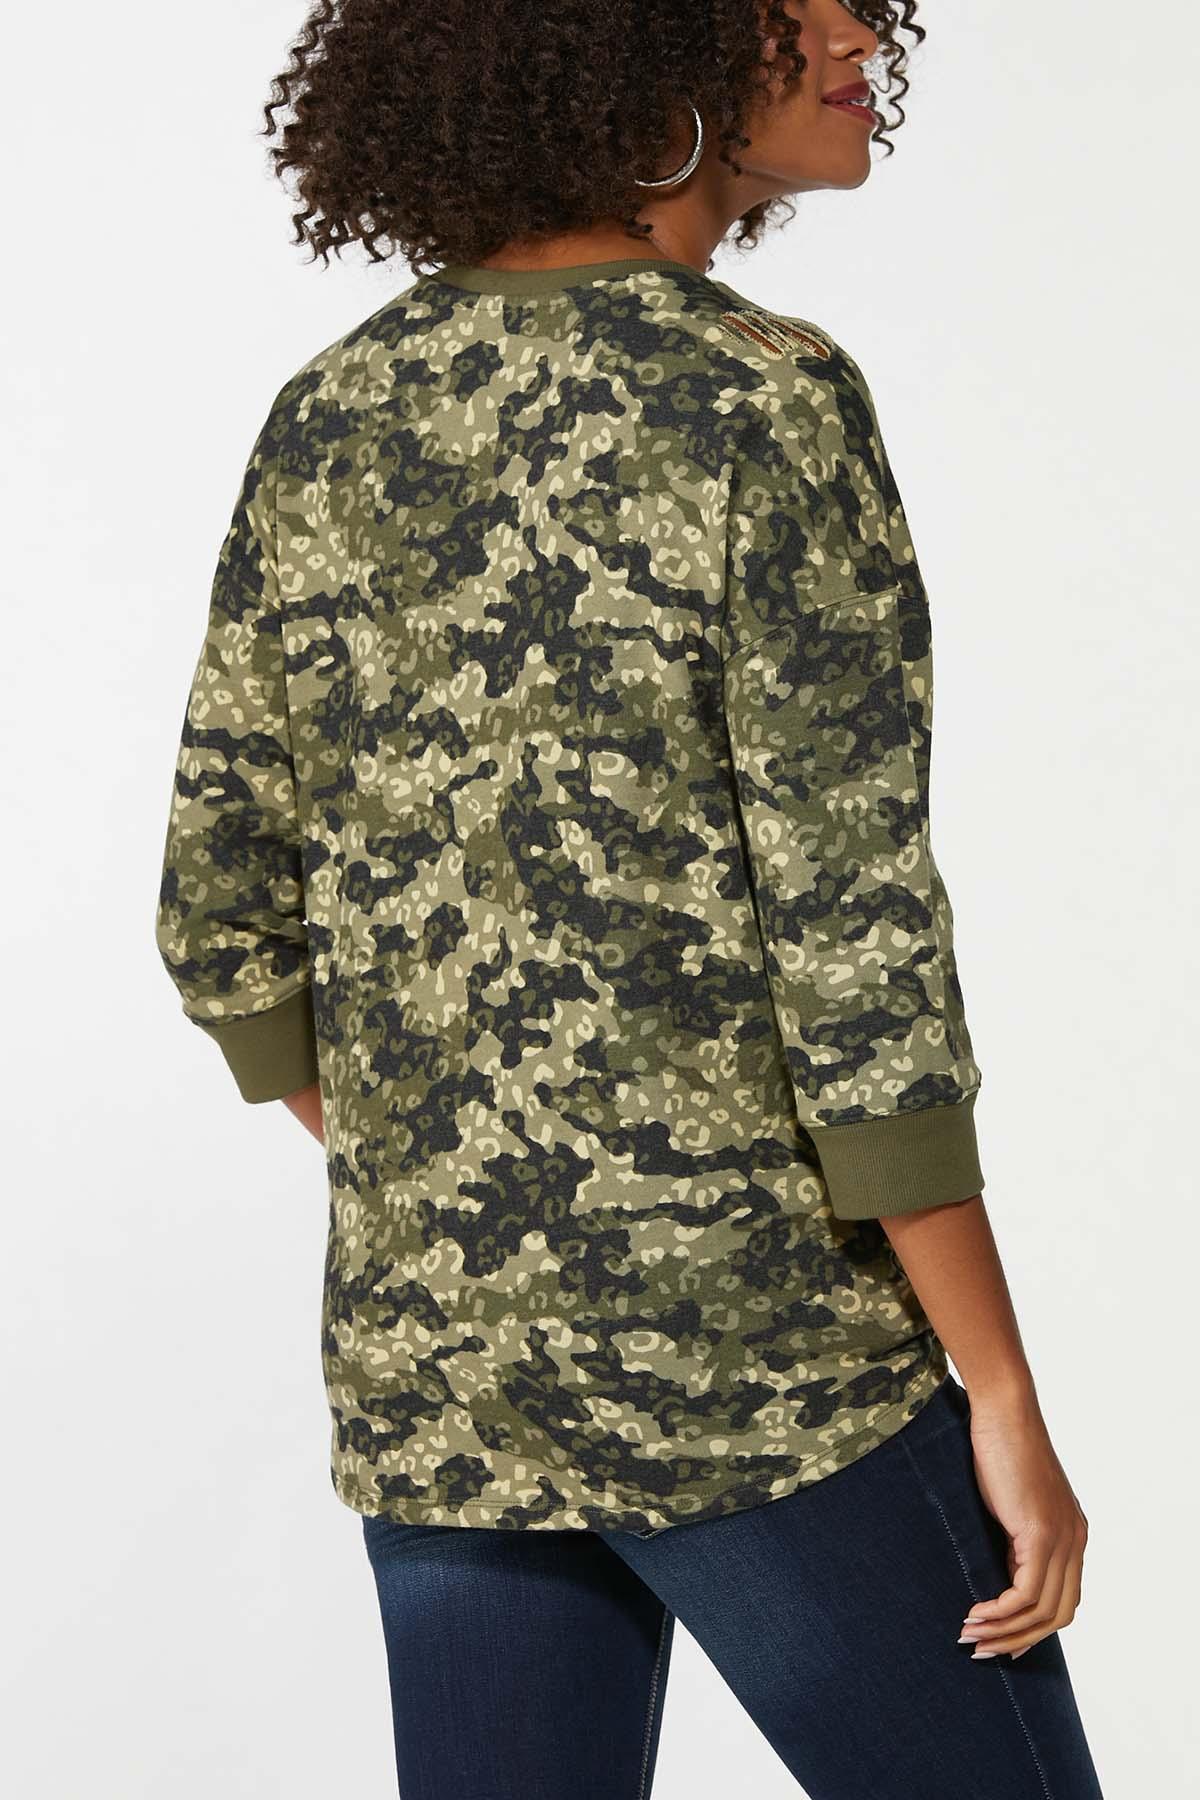 Distressed Camo Animal Sweatshirt (Item #44702850)